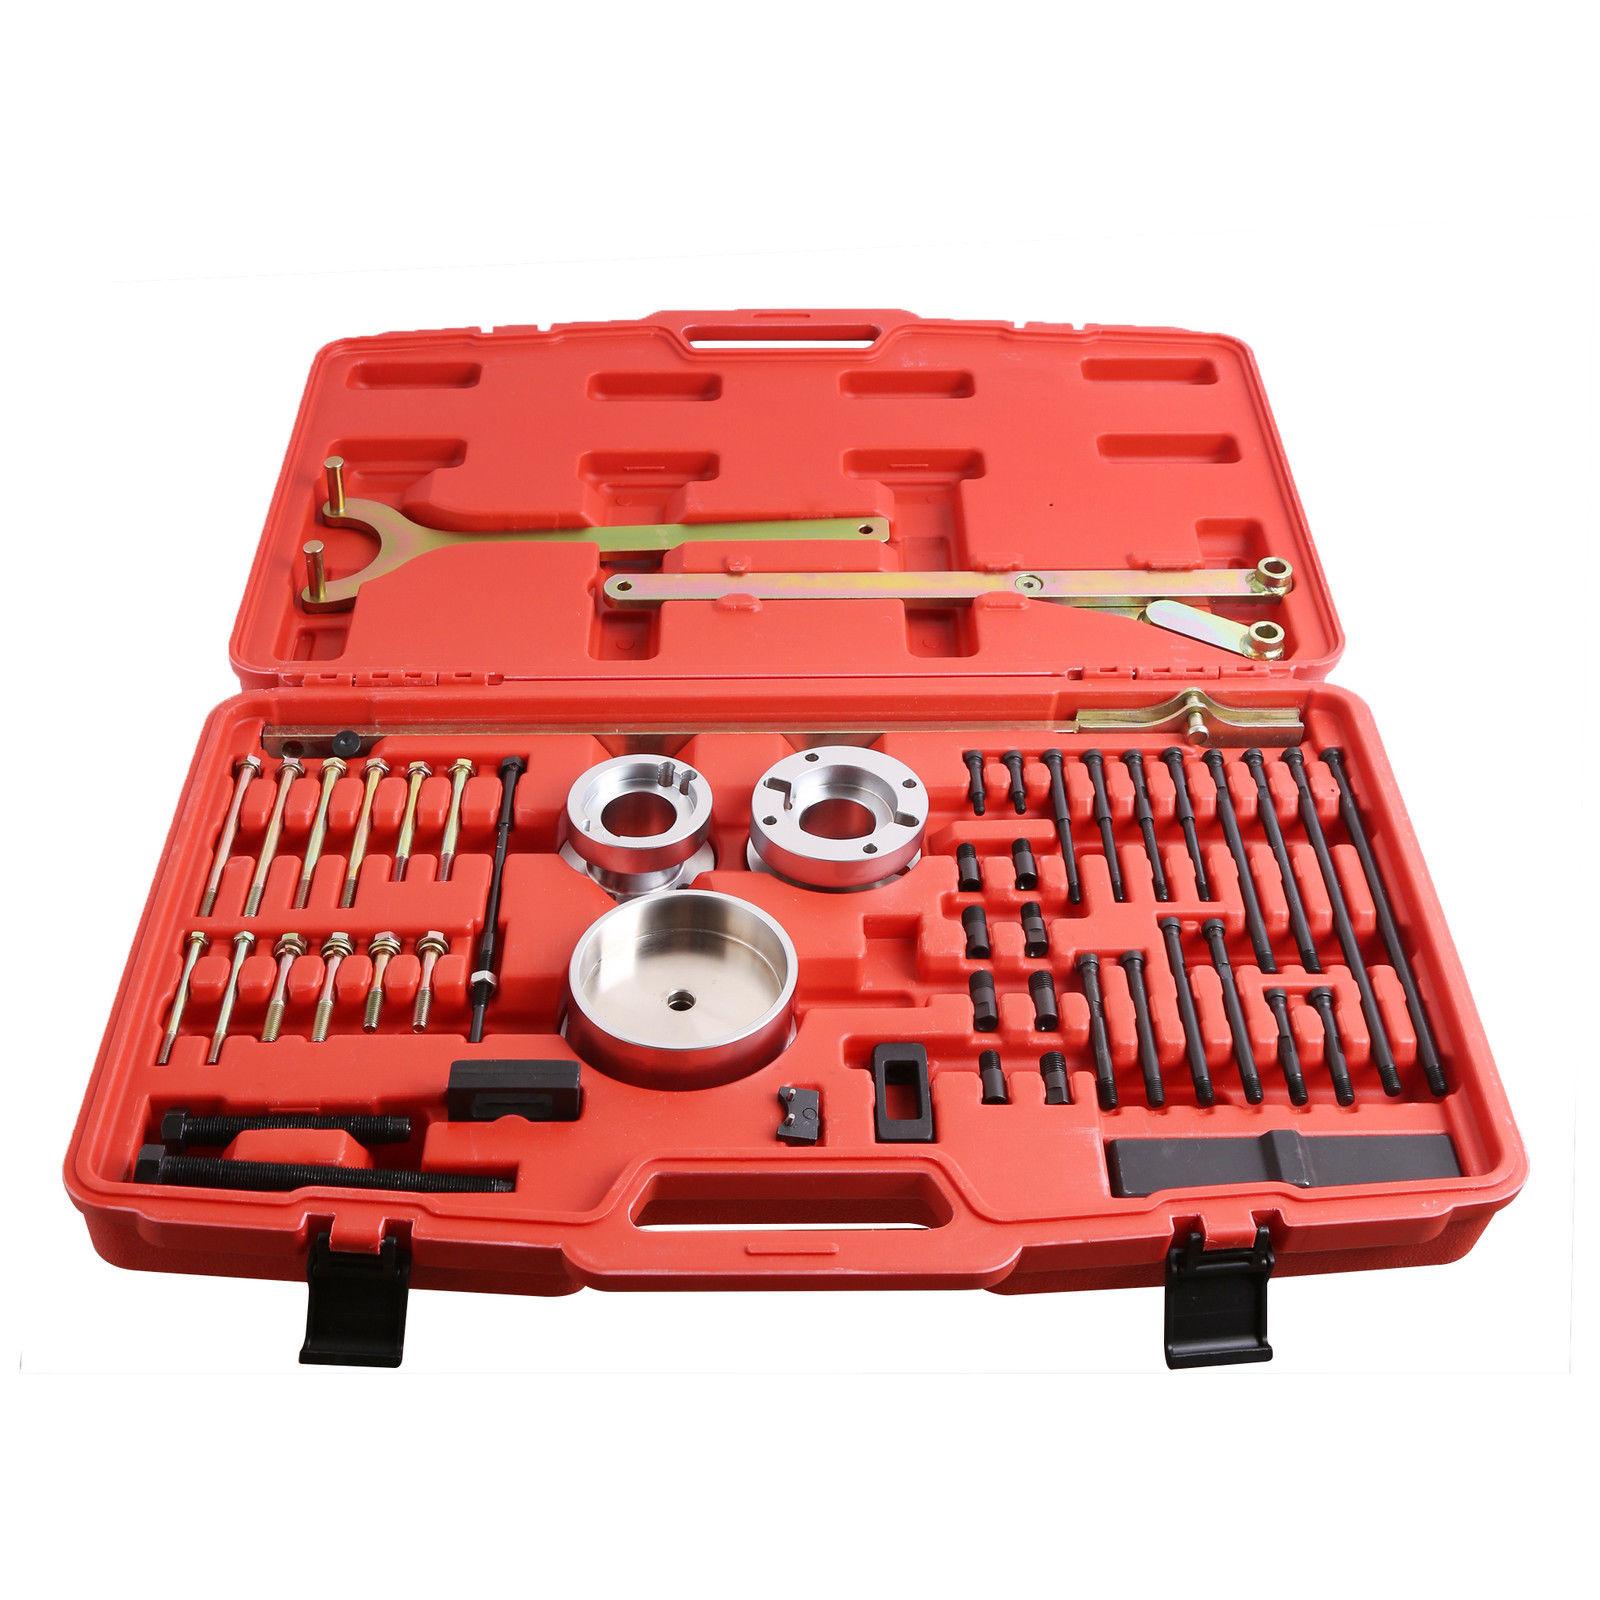 Toyota Mitsubishi Timing Tool Master Kit Japanese Engine Lots of Models